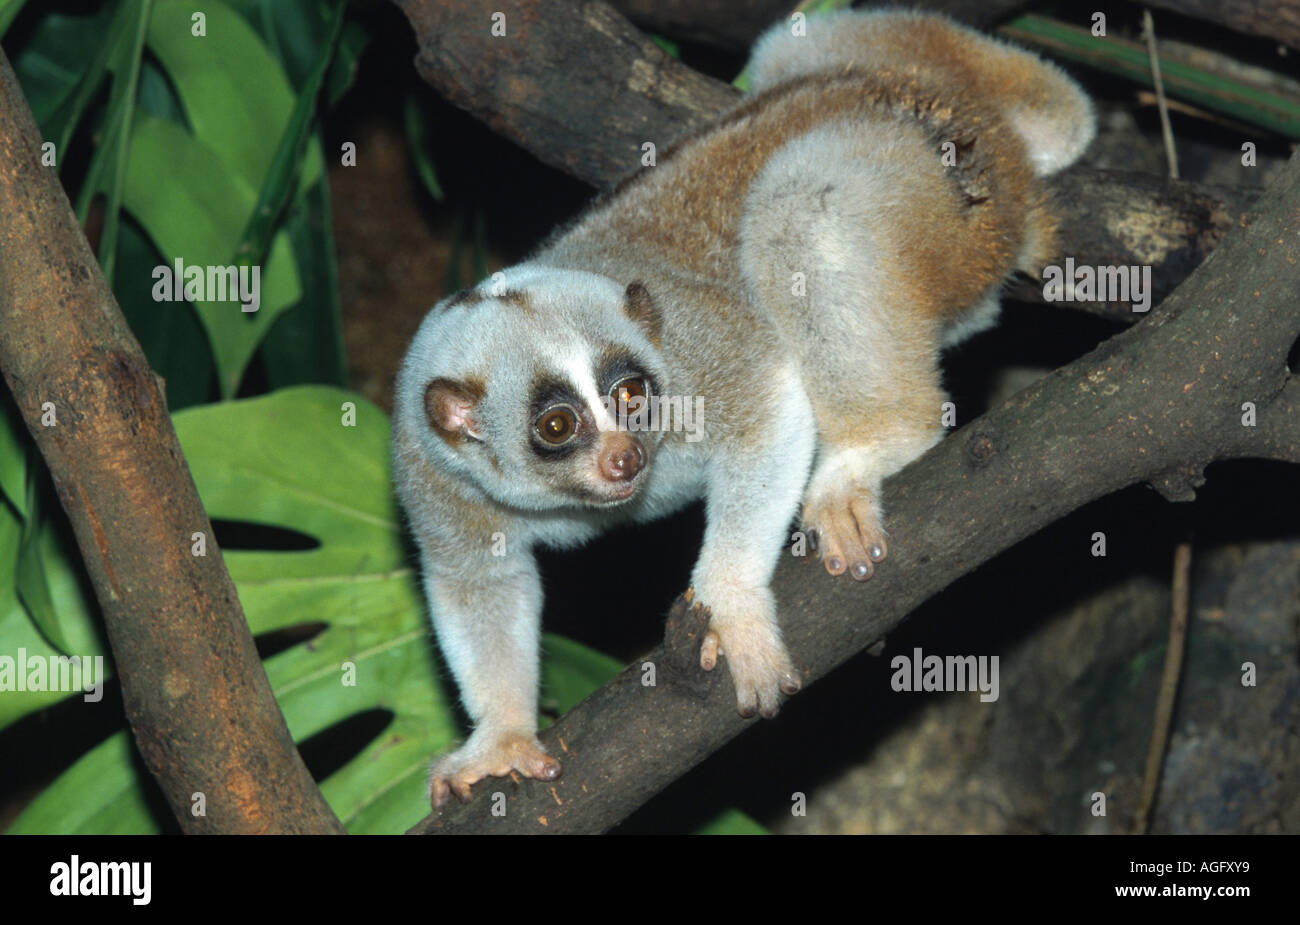 Slow loris, cu lan (Nycticebus coucang), sul ramo, Indonesia, Borneo Immagini Stock